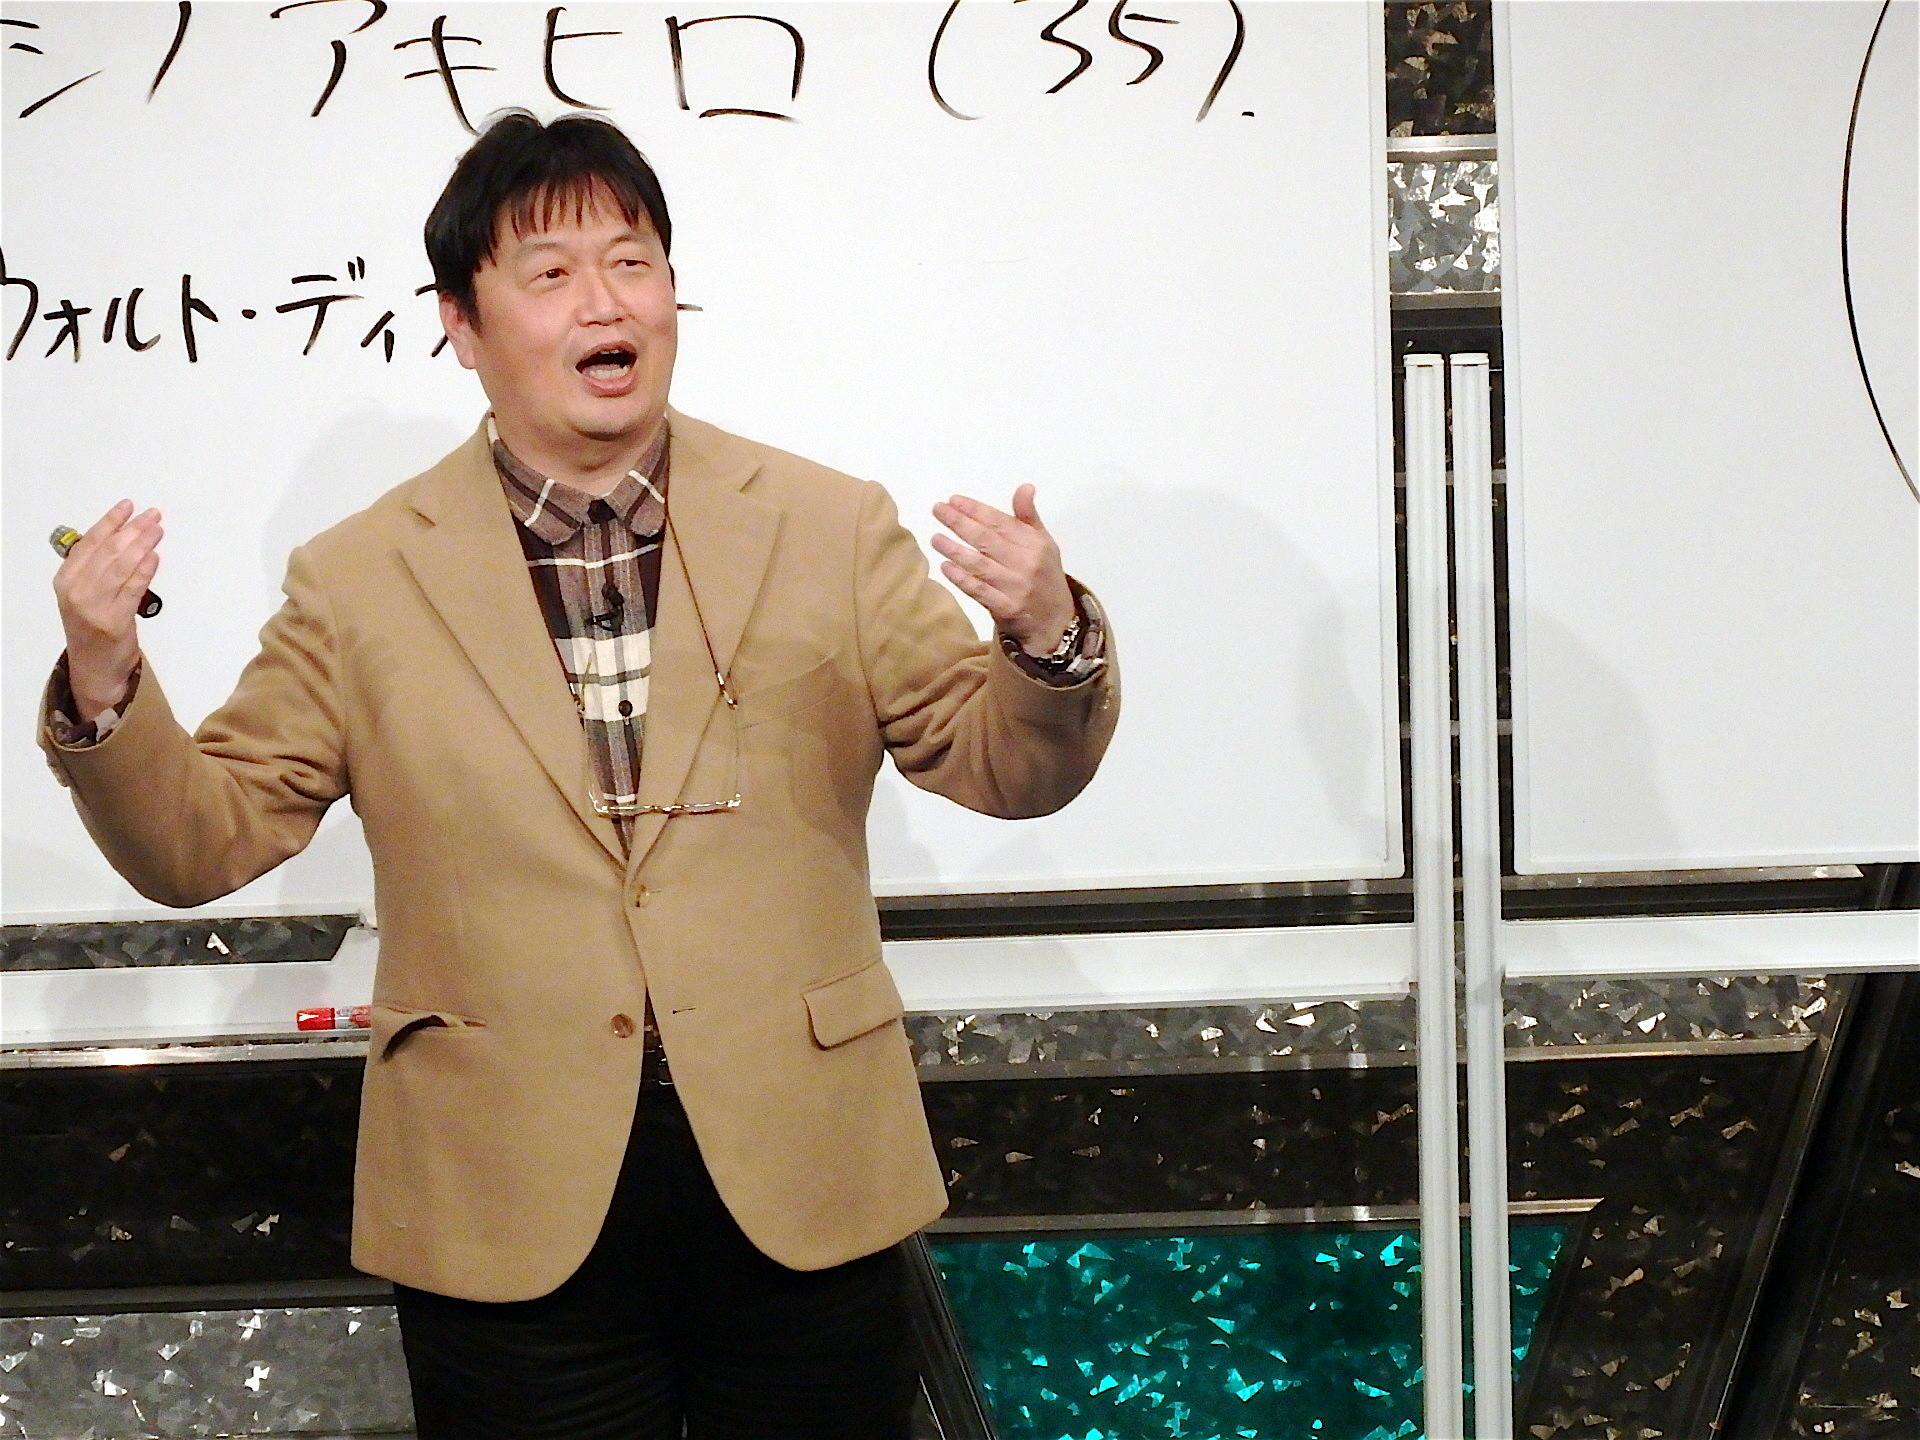 http://news.yoshimoto.co.jp/20160116181109-76a2a22f143b34ba57bdb13068aa8f7e5996c186.jpg